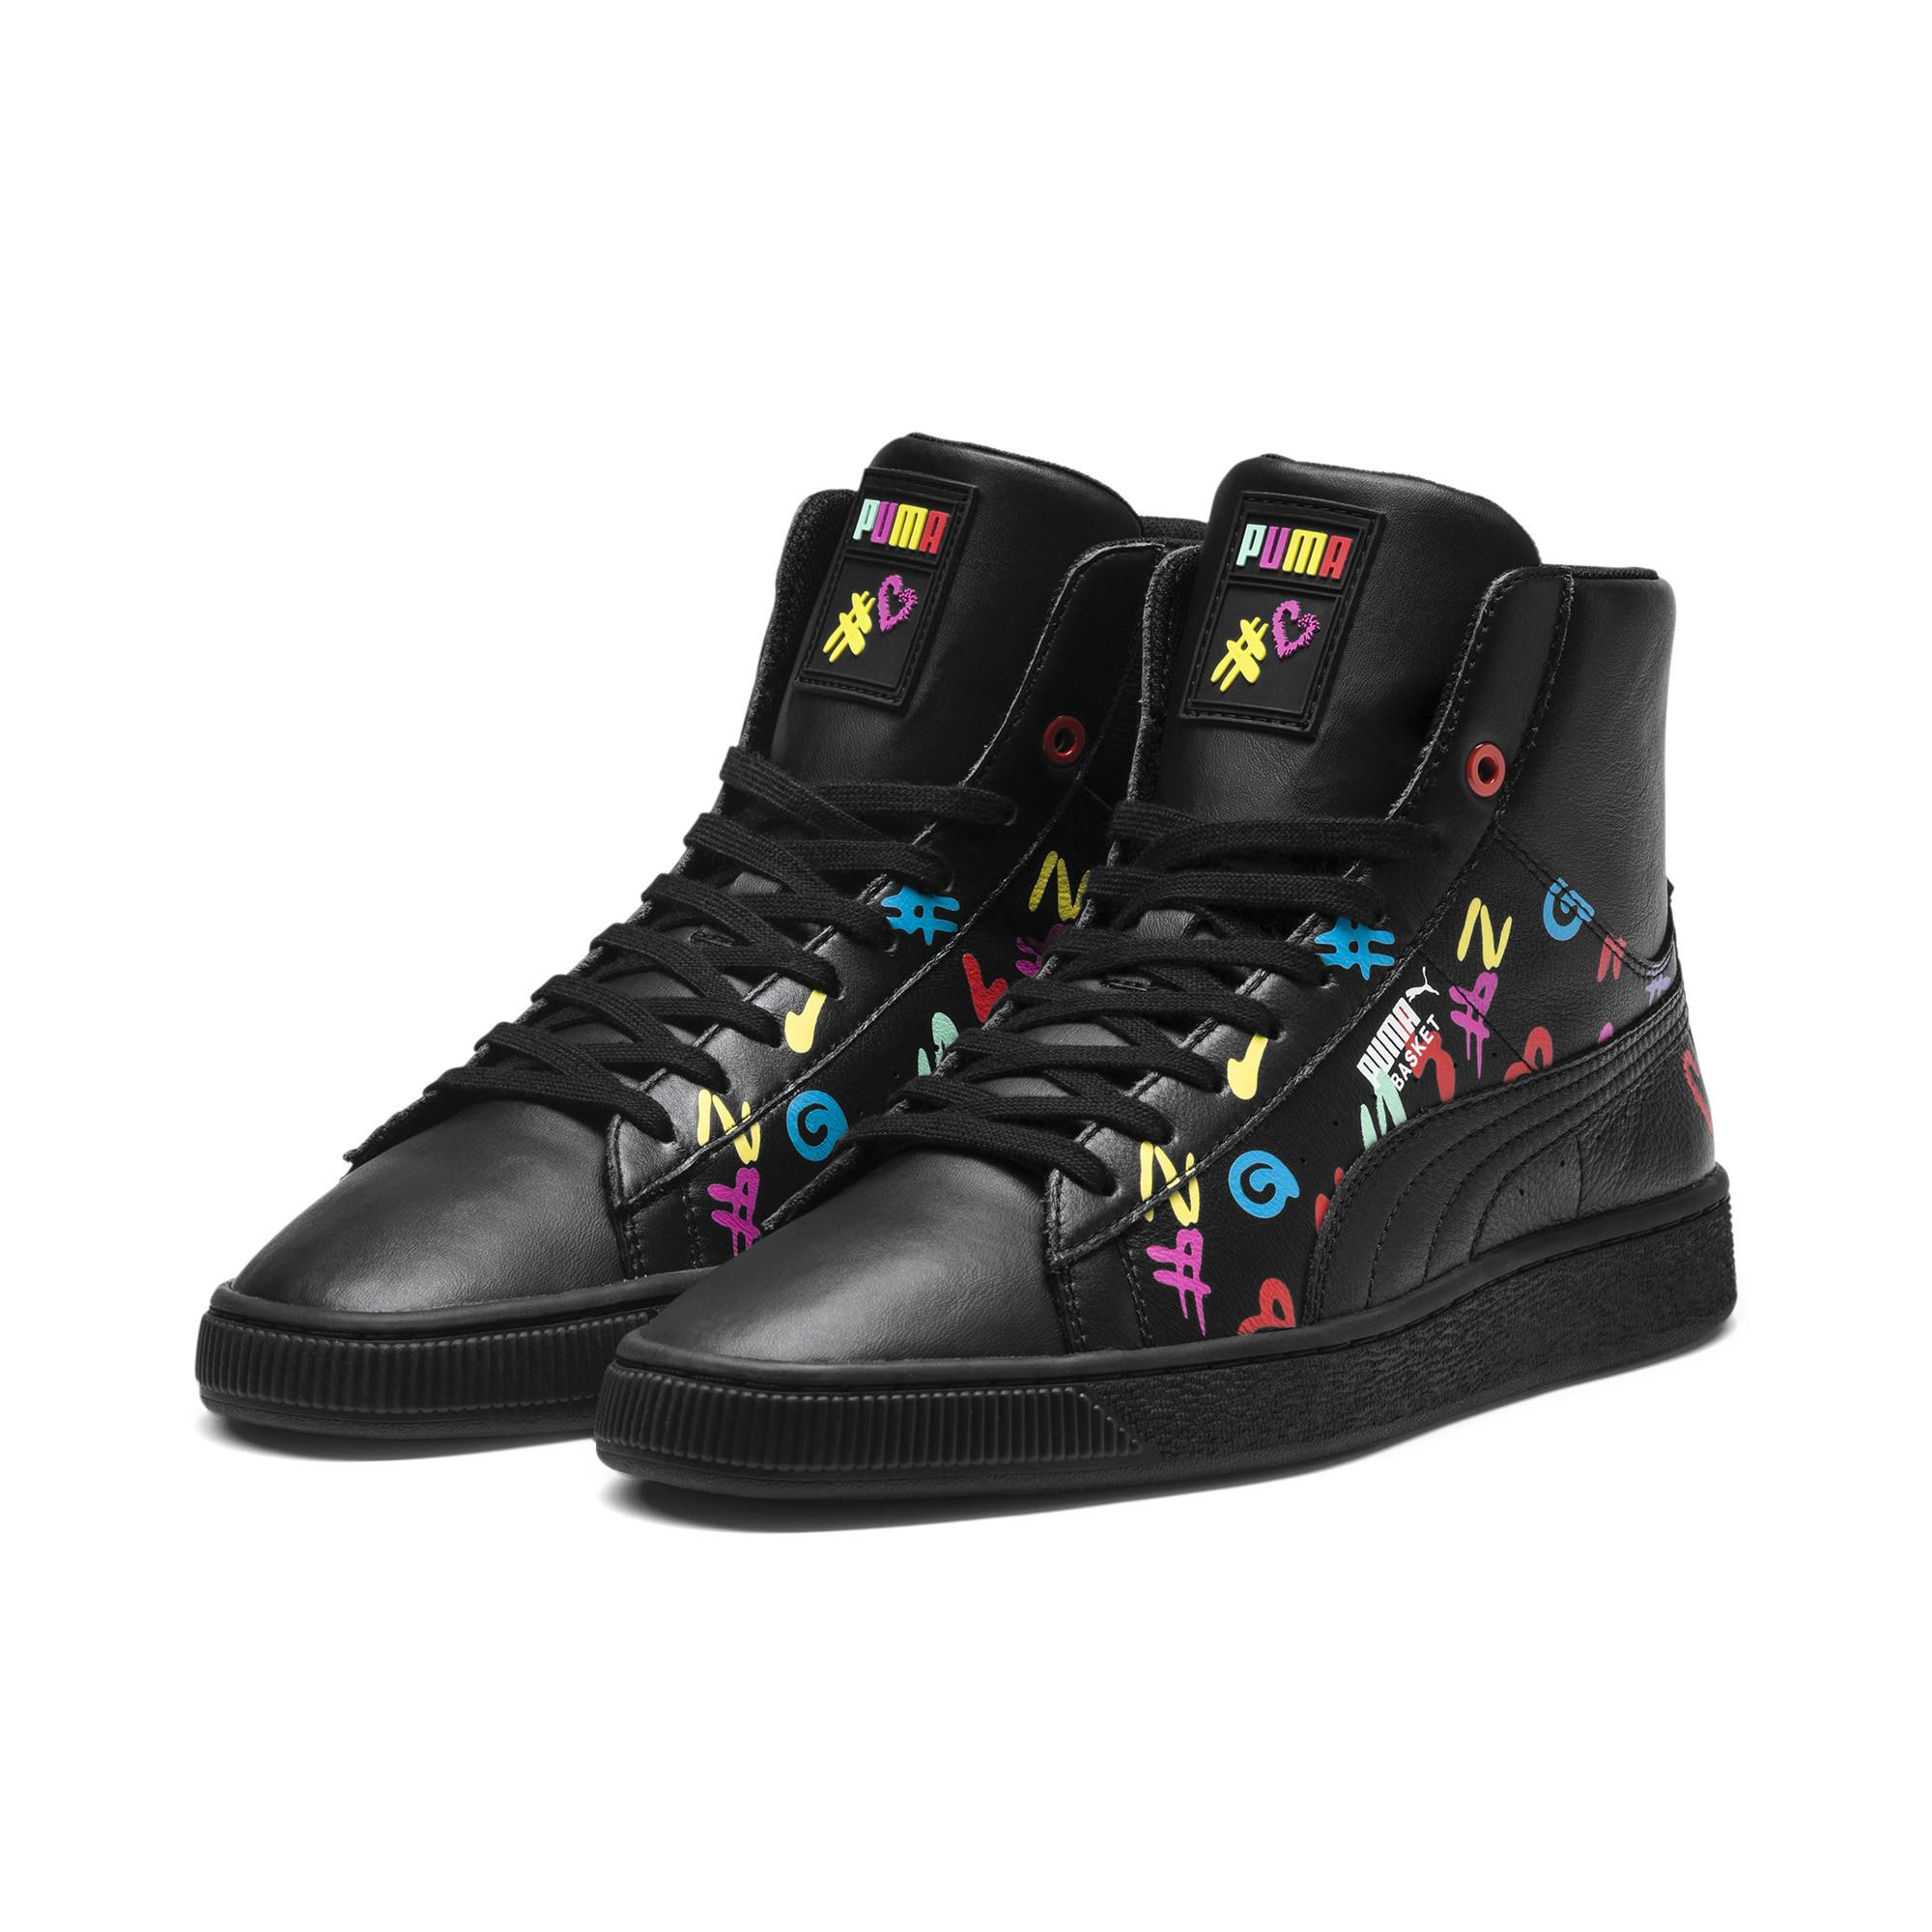 1313d26251 PUMA Black X Bradley Theodore Mid Basket Shoes for men